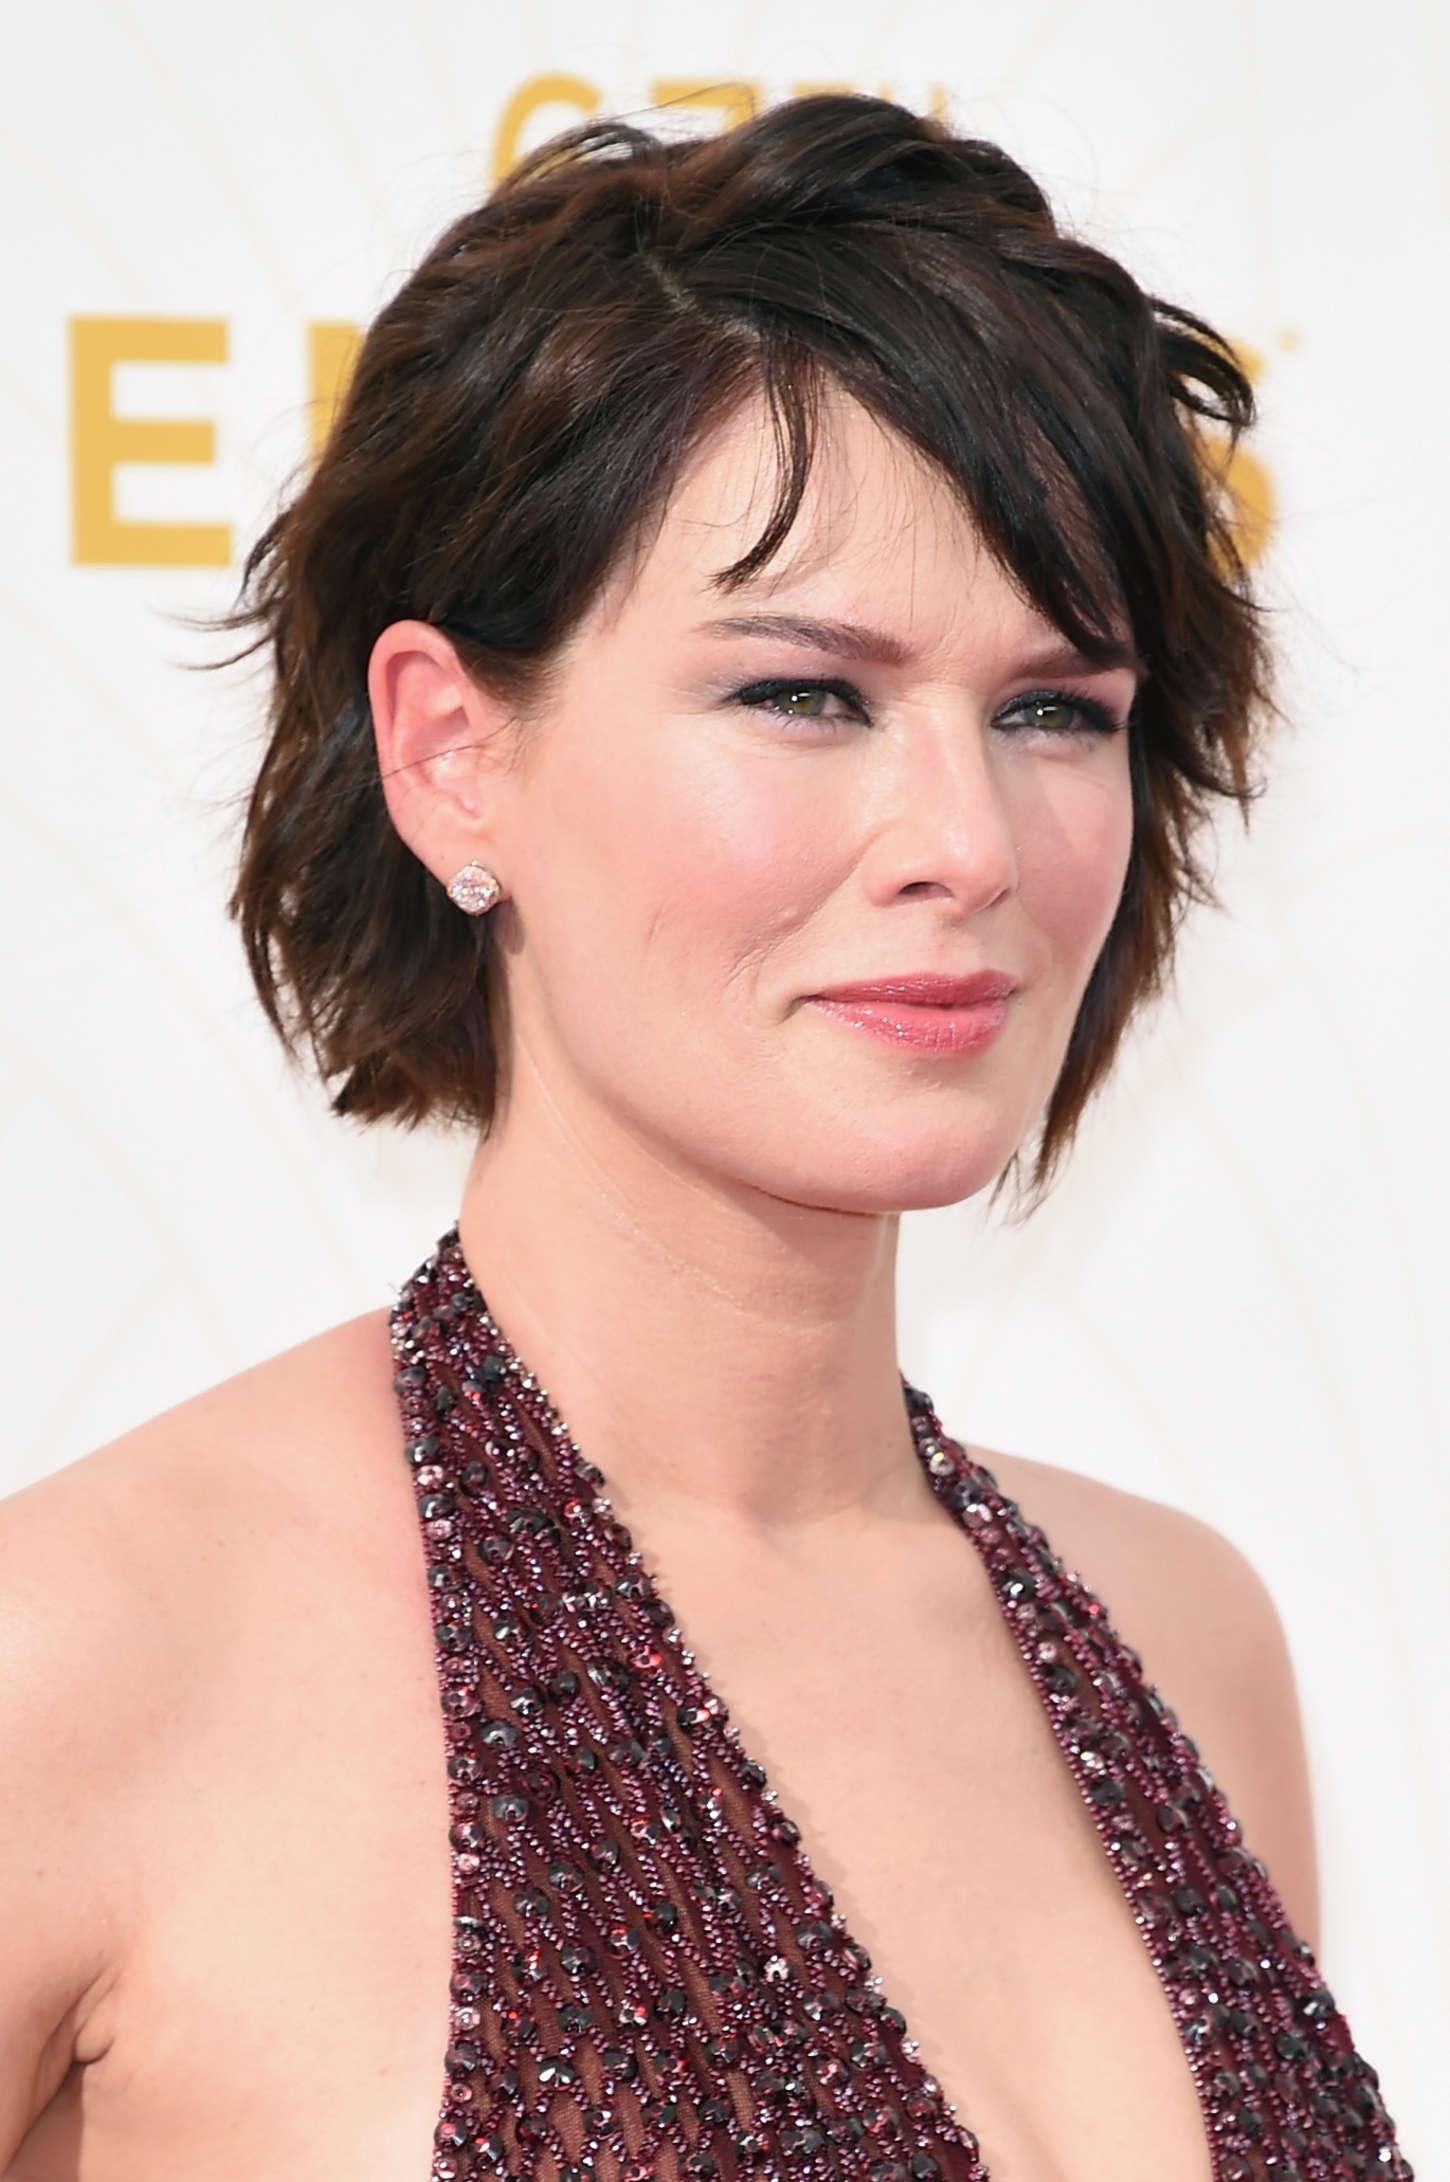 Lena Headey 2015 : Lena Headey: 2015 Emmy Awards -05